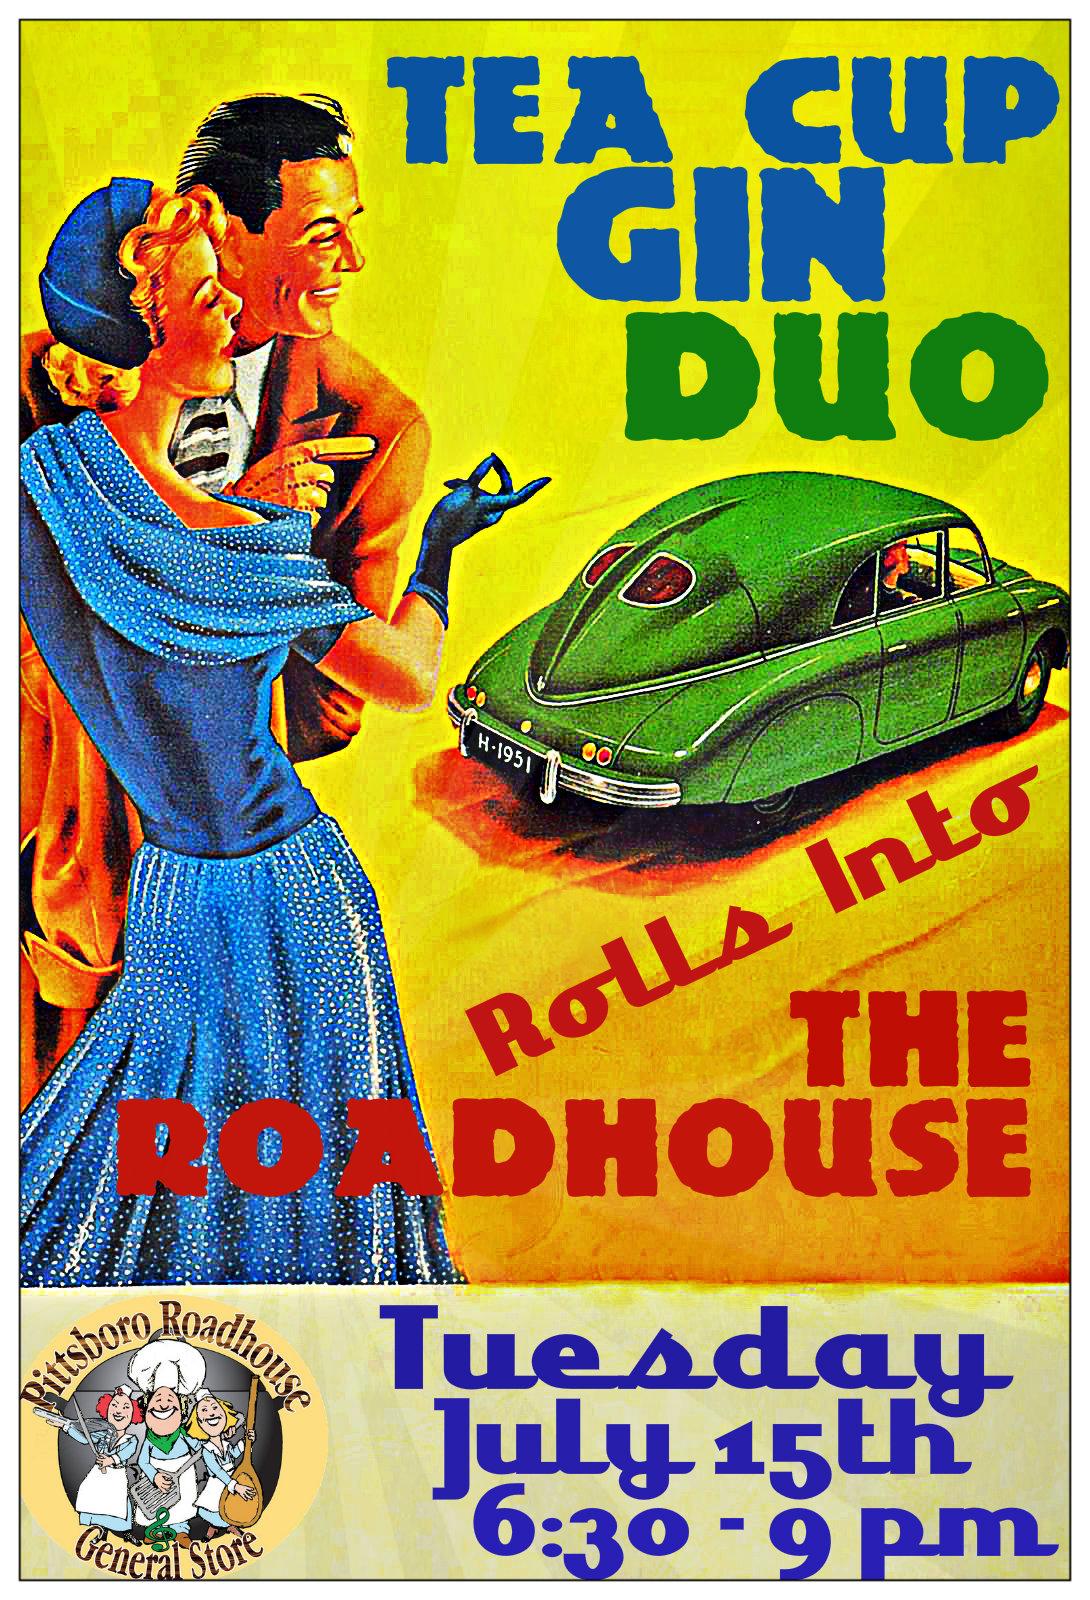 Roadhouse July 15th Final